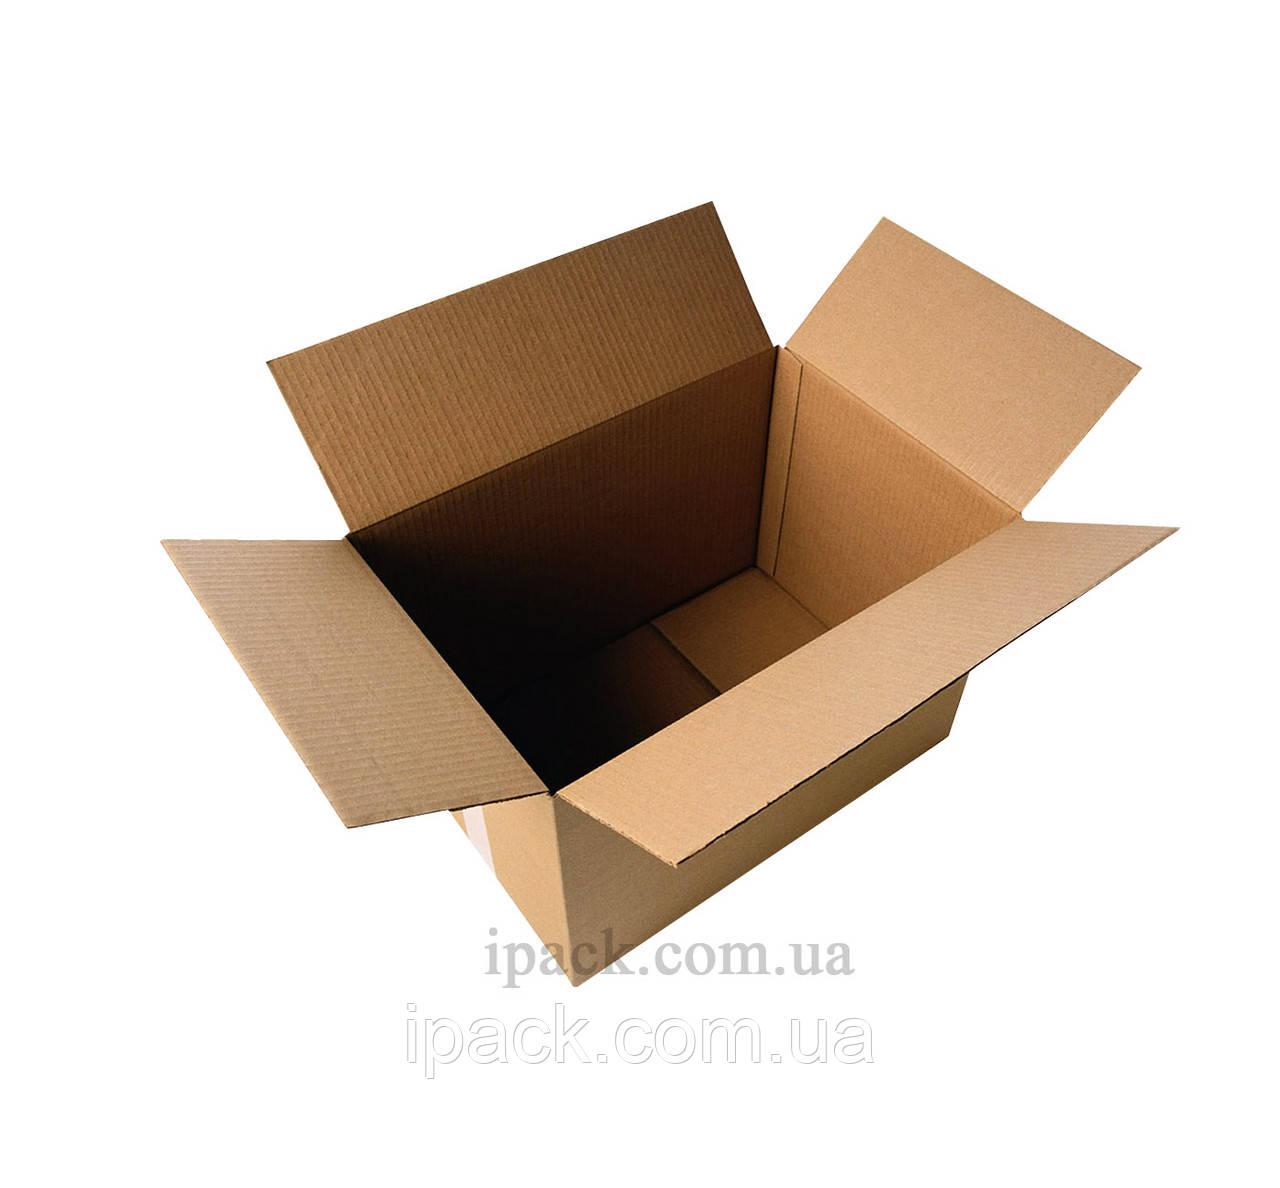 Гофроящик 235*235*210 мм, бурый, четырехклапанный картонный короб